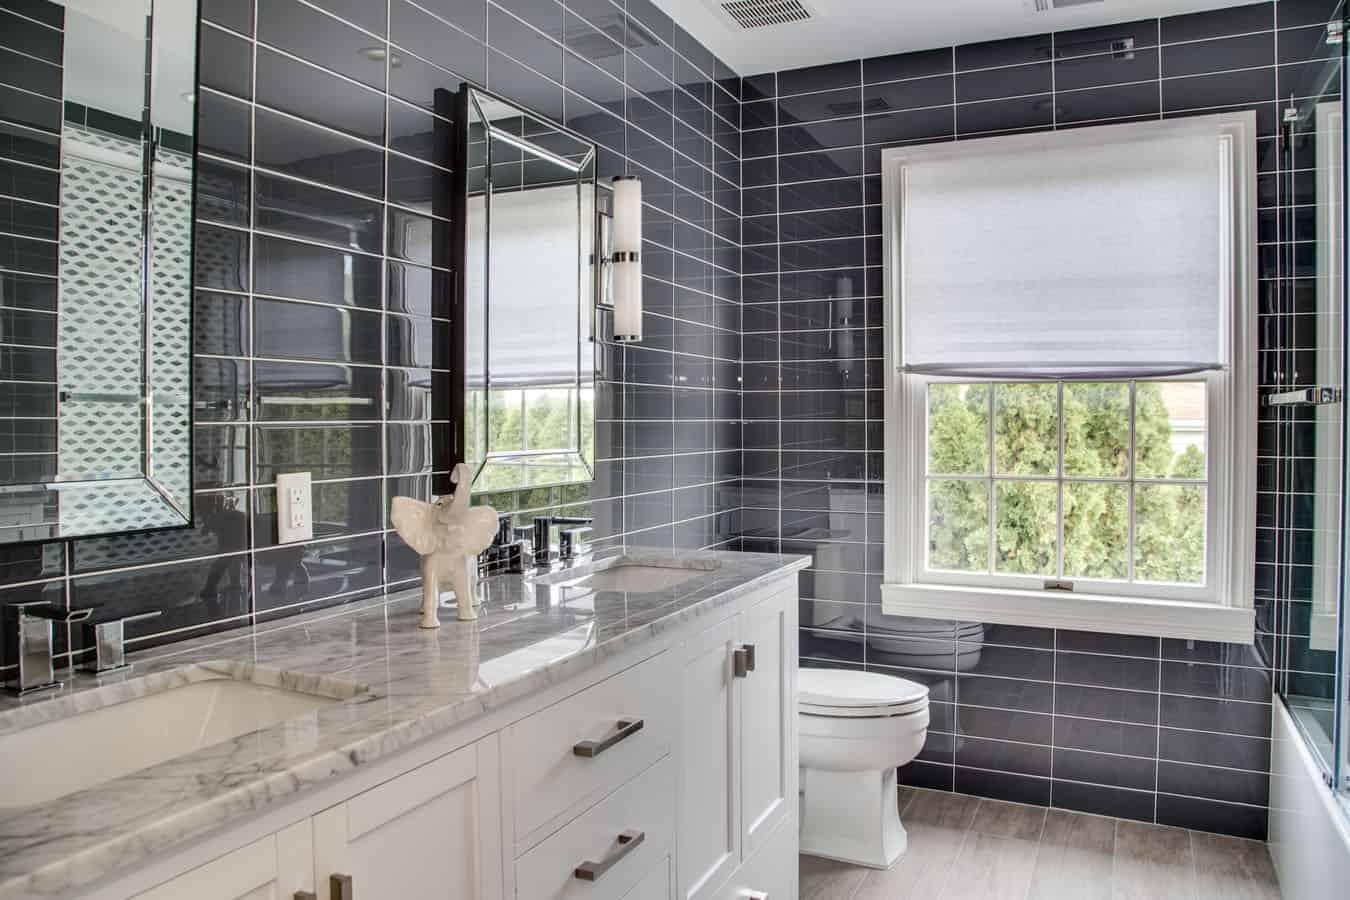 Jericho NY Bathroom remodel interior design